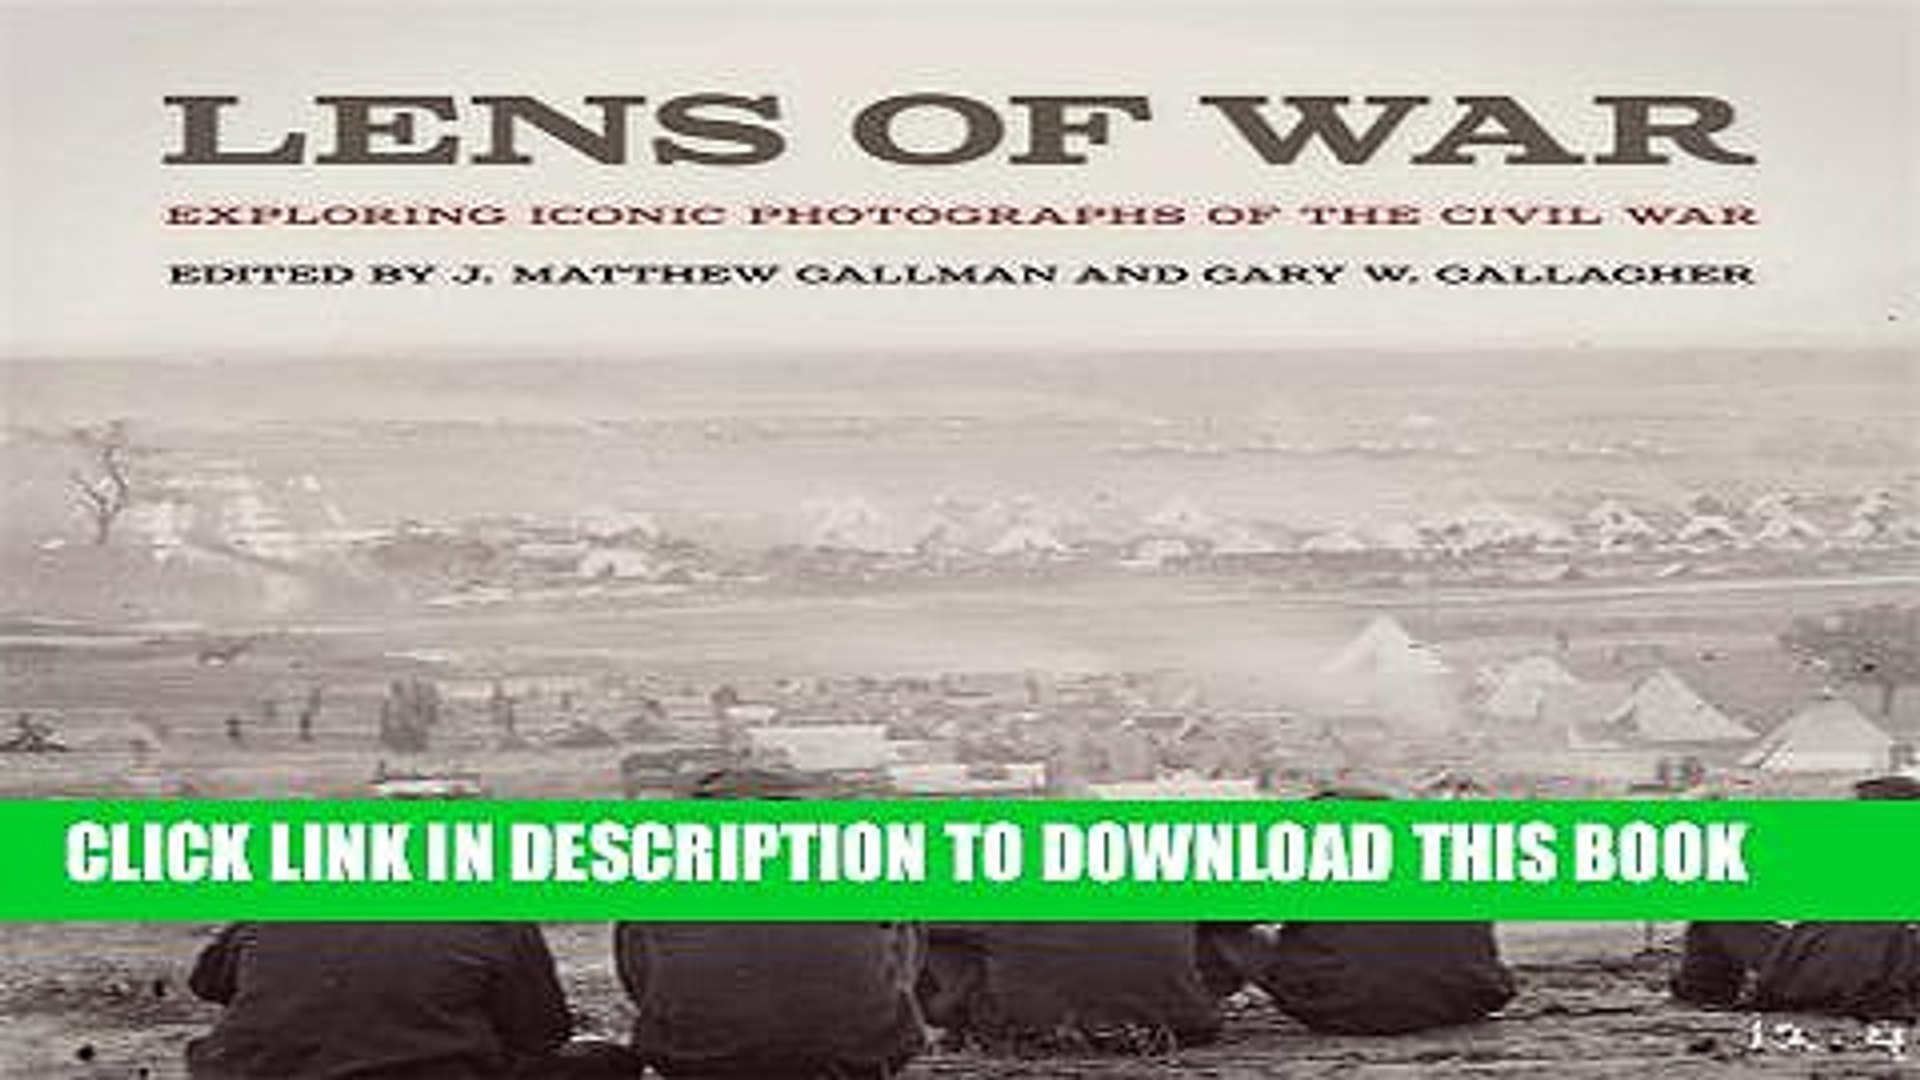 [PDF] Lens of War: Exploring Iconic Photographs of the Civil War (UnCivil Wars Ser.) Popular Online